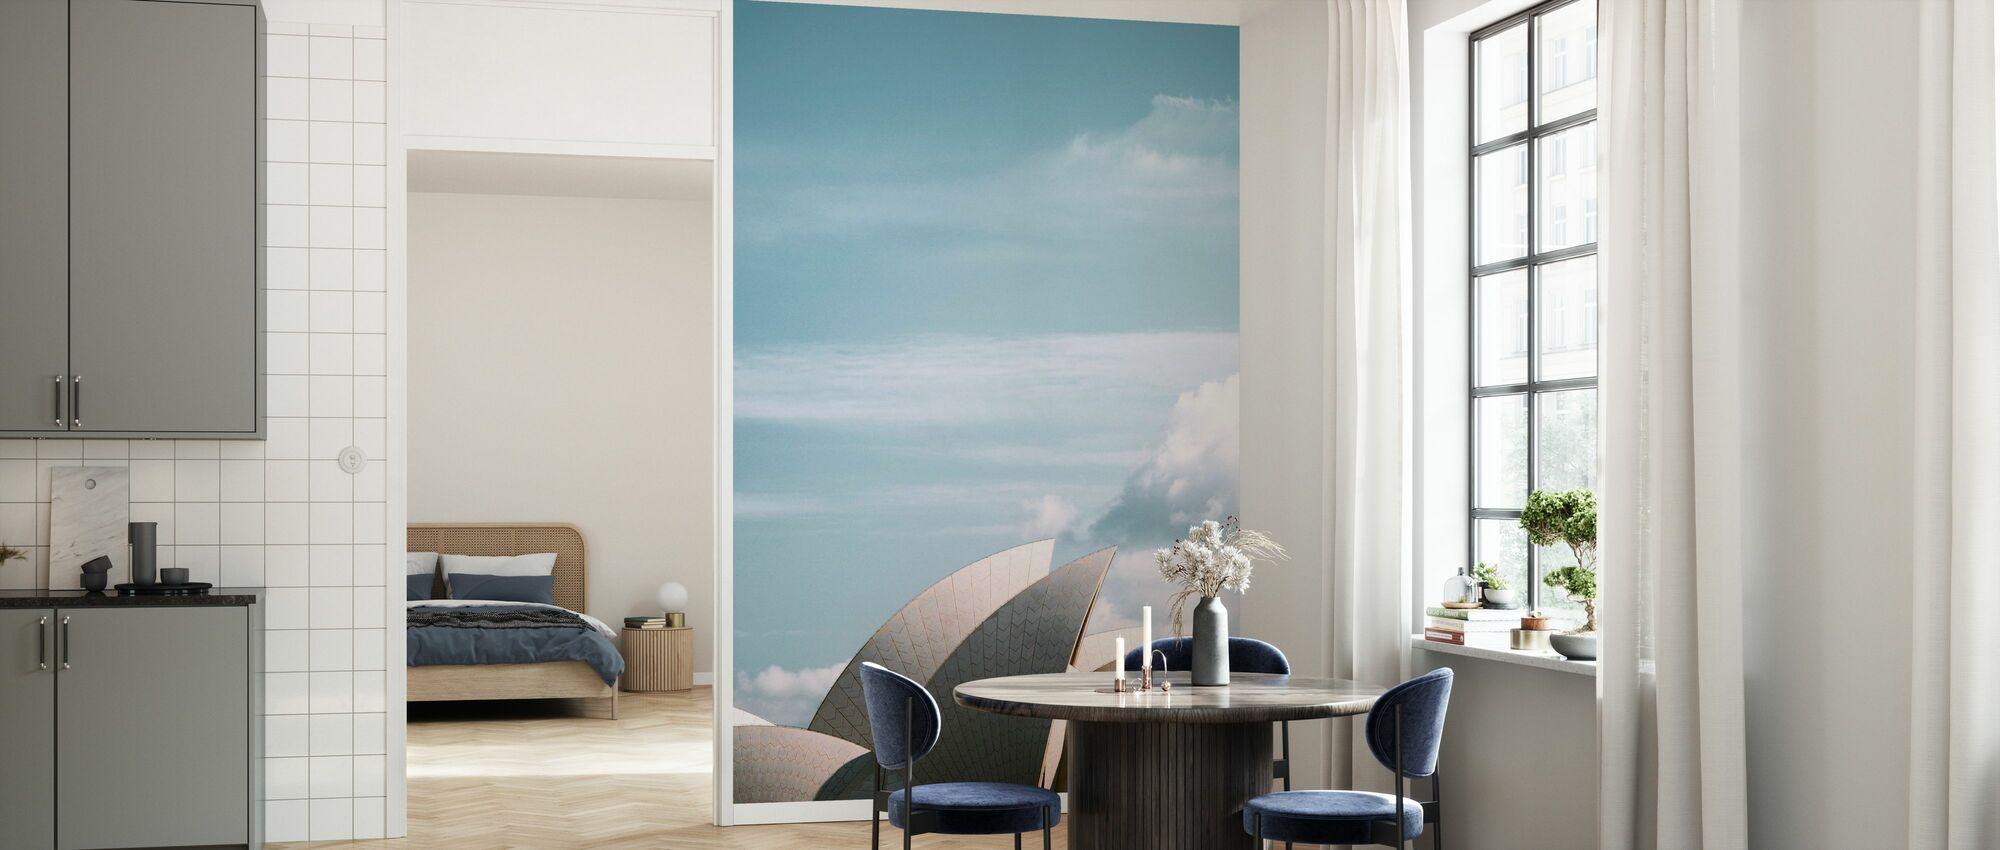 Sydney Opera House - Wallpaper - Kitchen